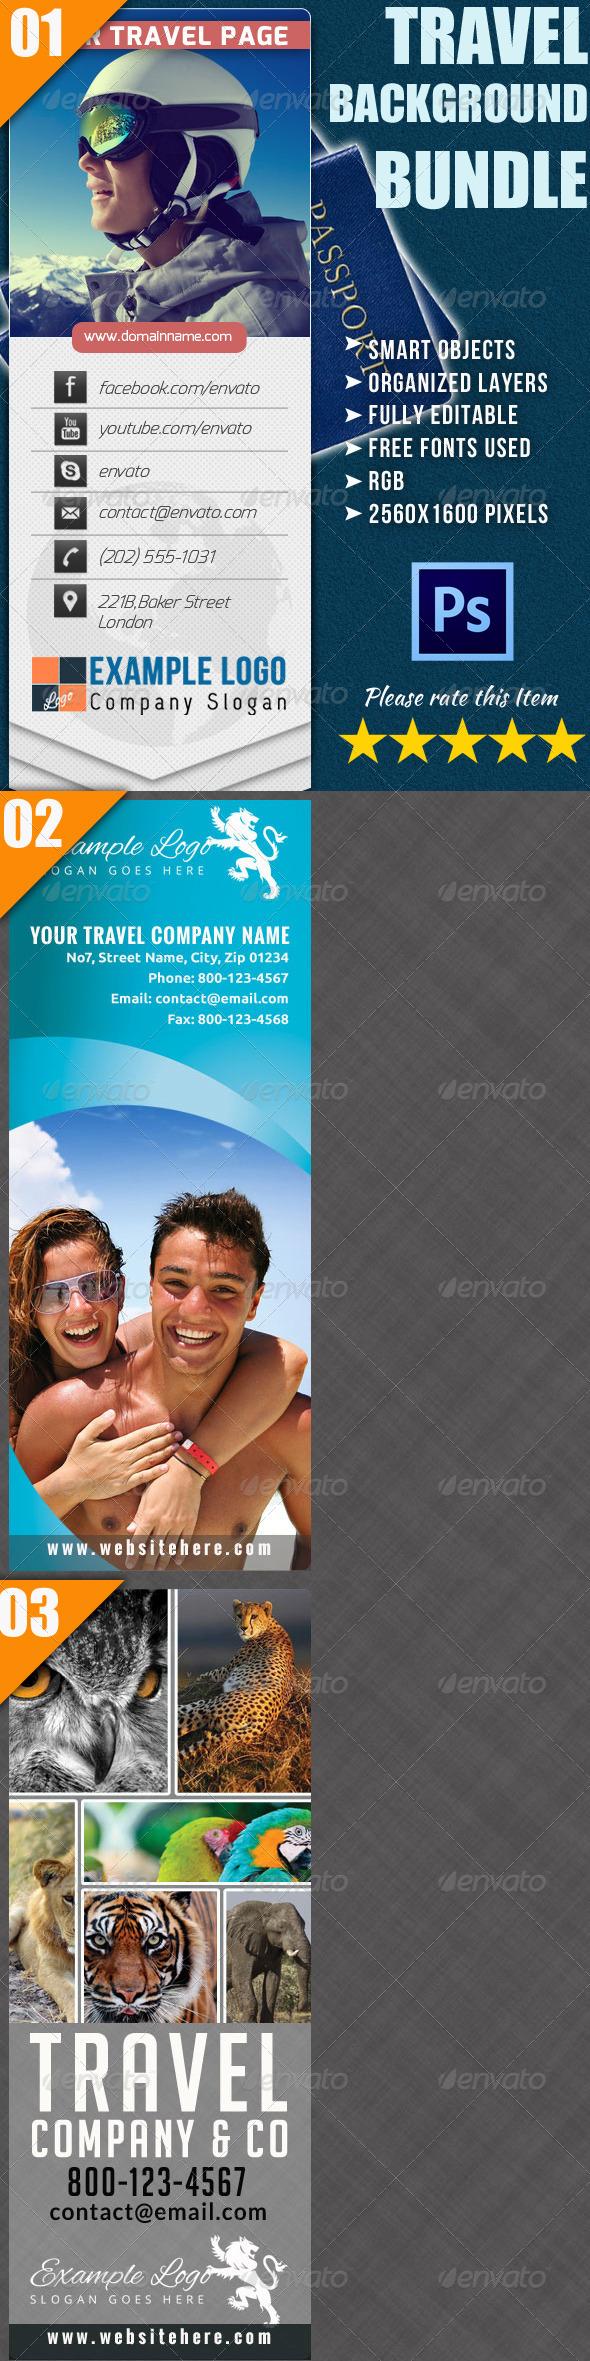 Travel Twitter Background Bundle - Twitter Social Media